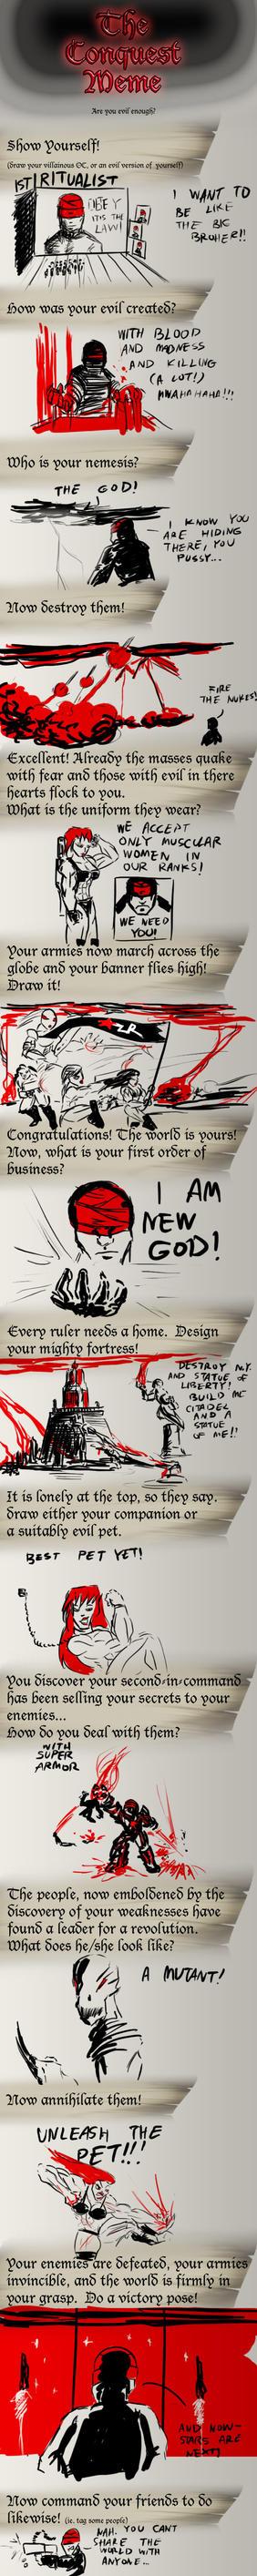 Conquest Meme by Ritualist